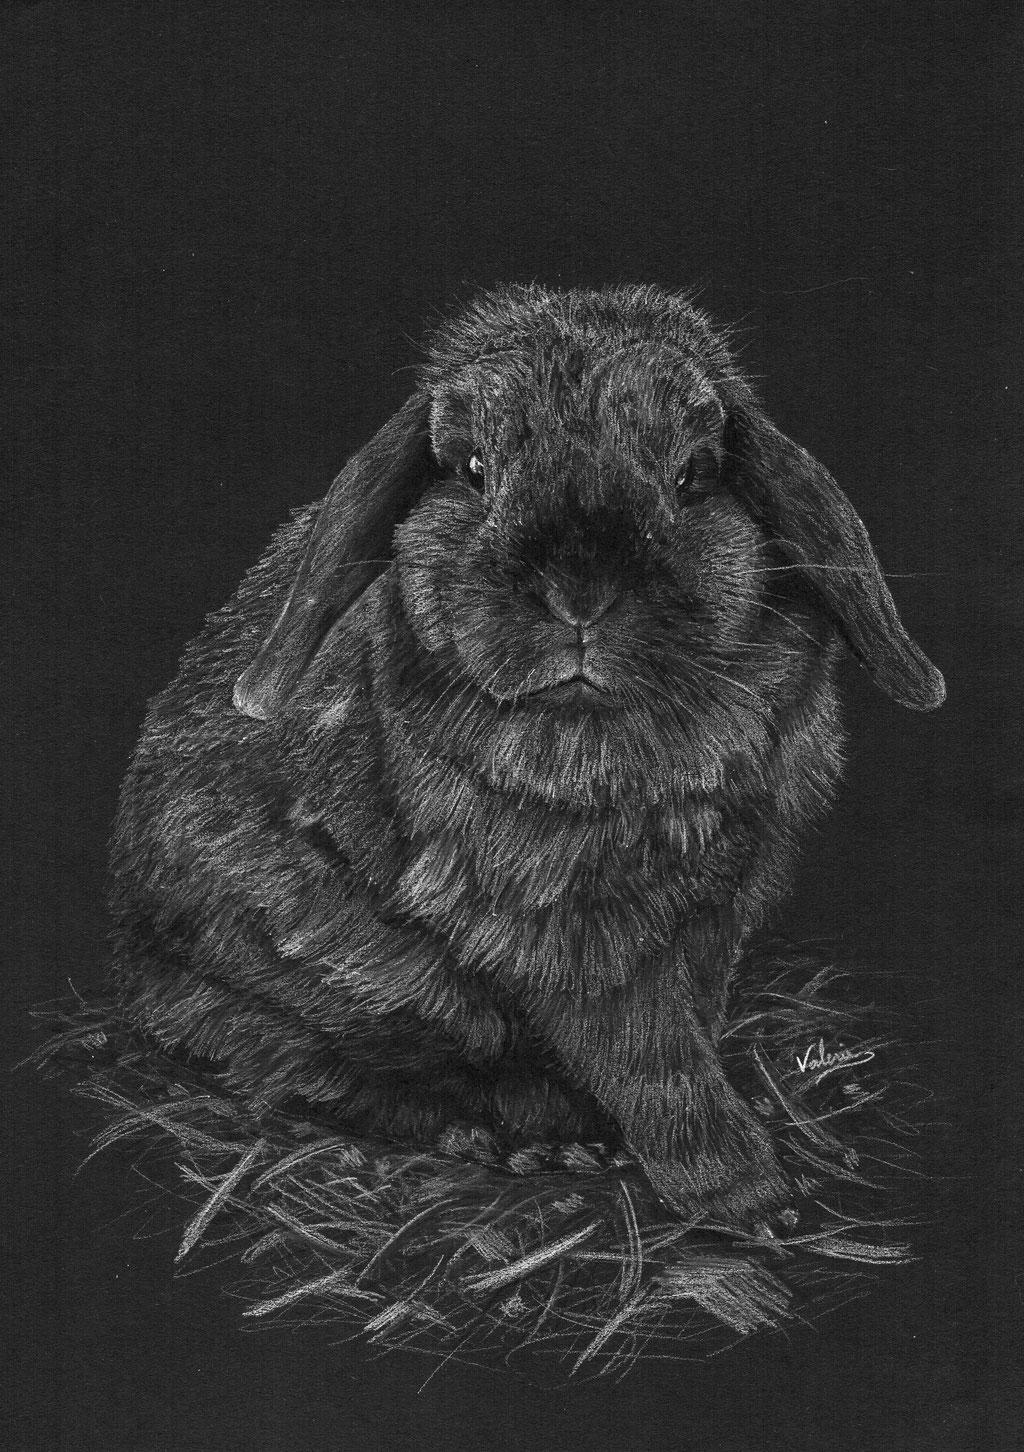 Dierenportret bruin konijn in stro: Wit potlood op zwart papier (2016)